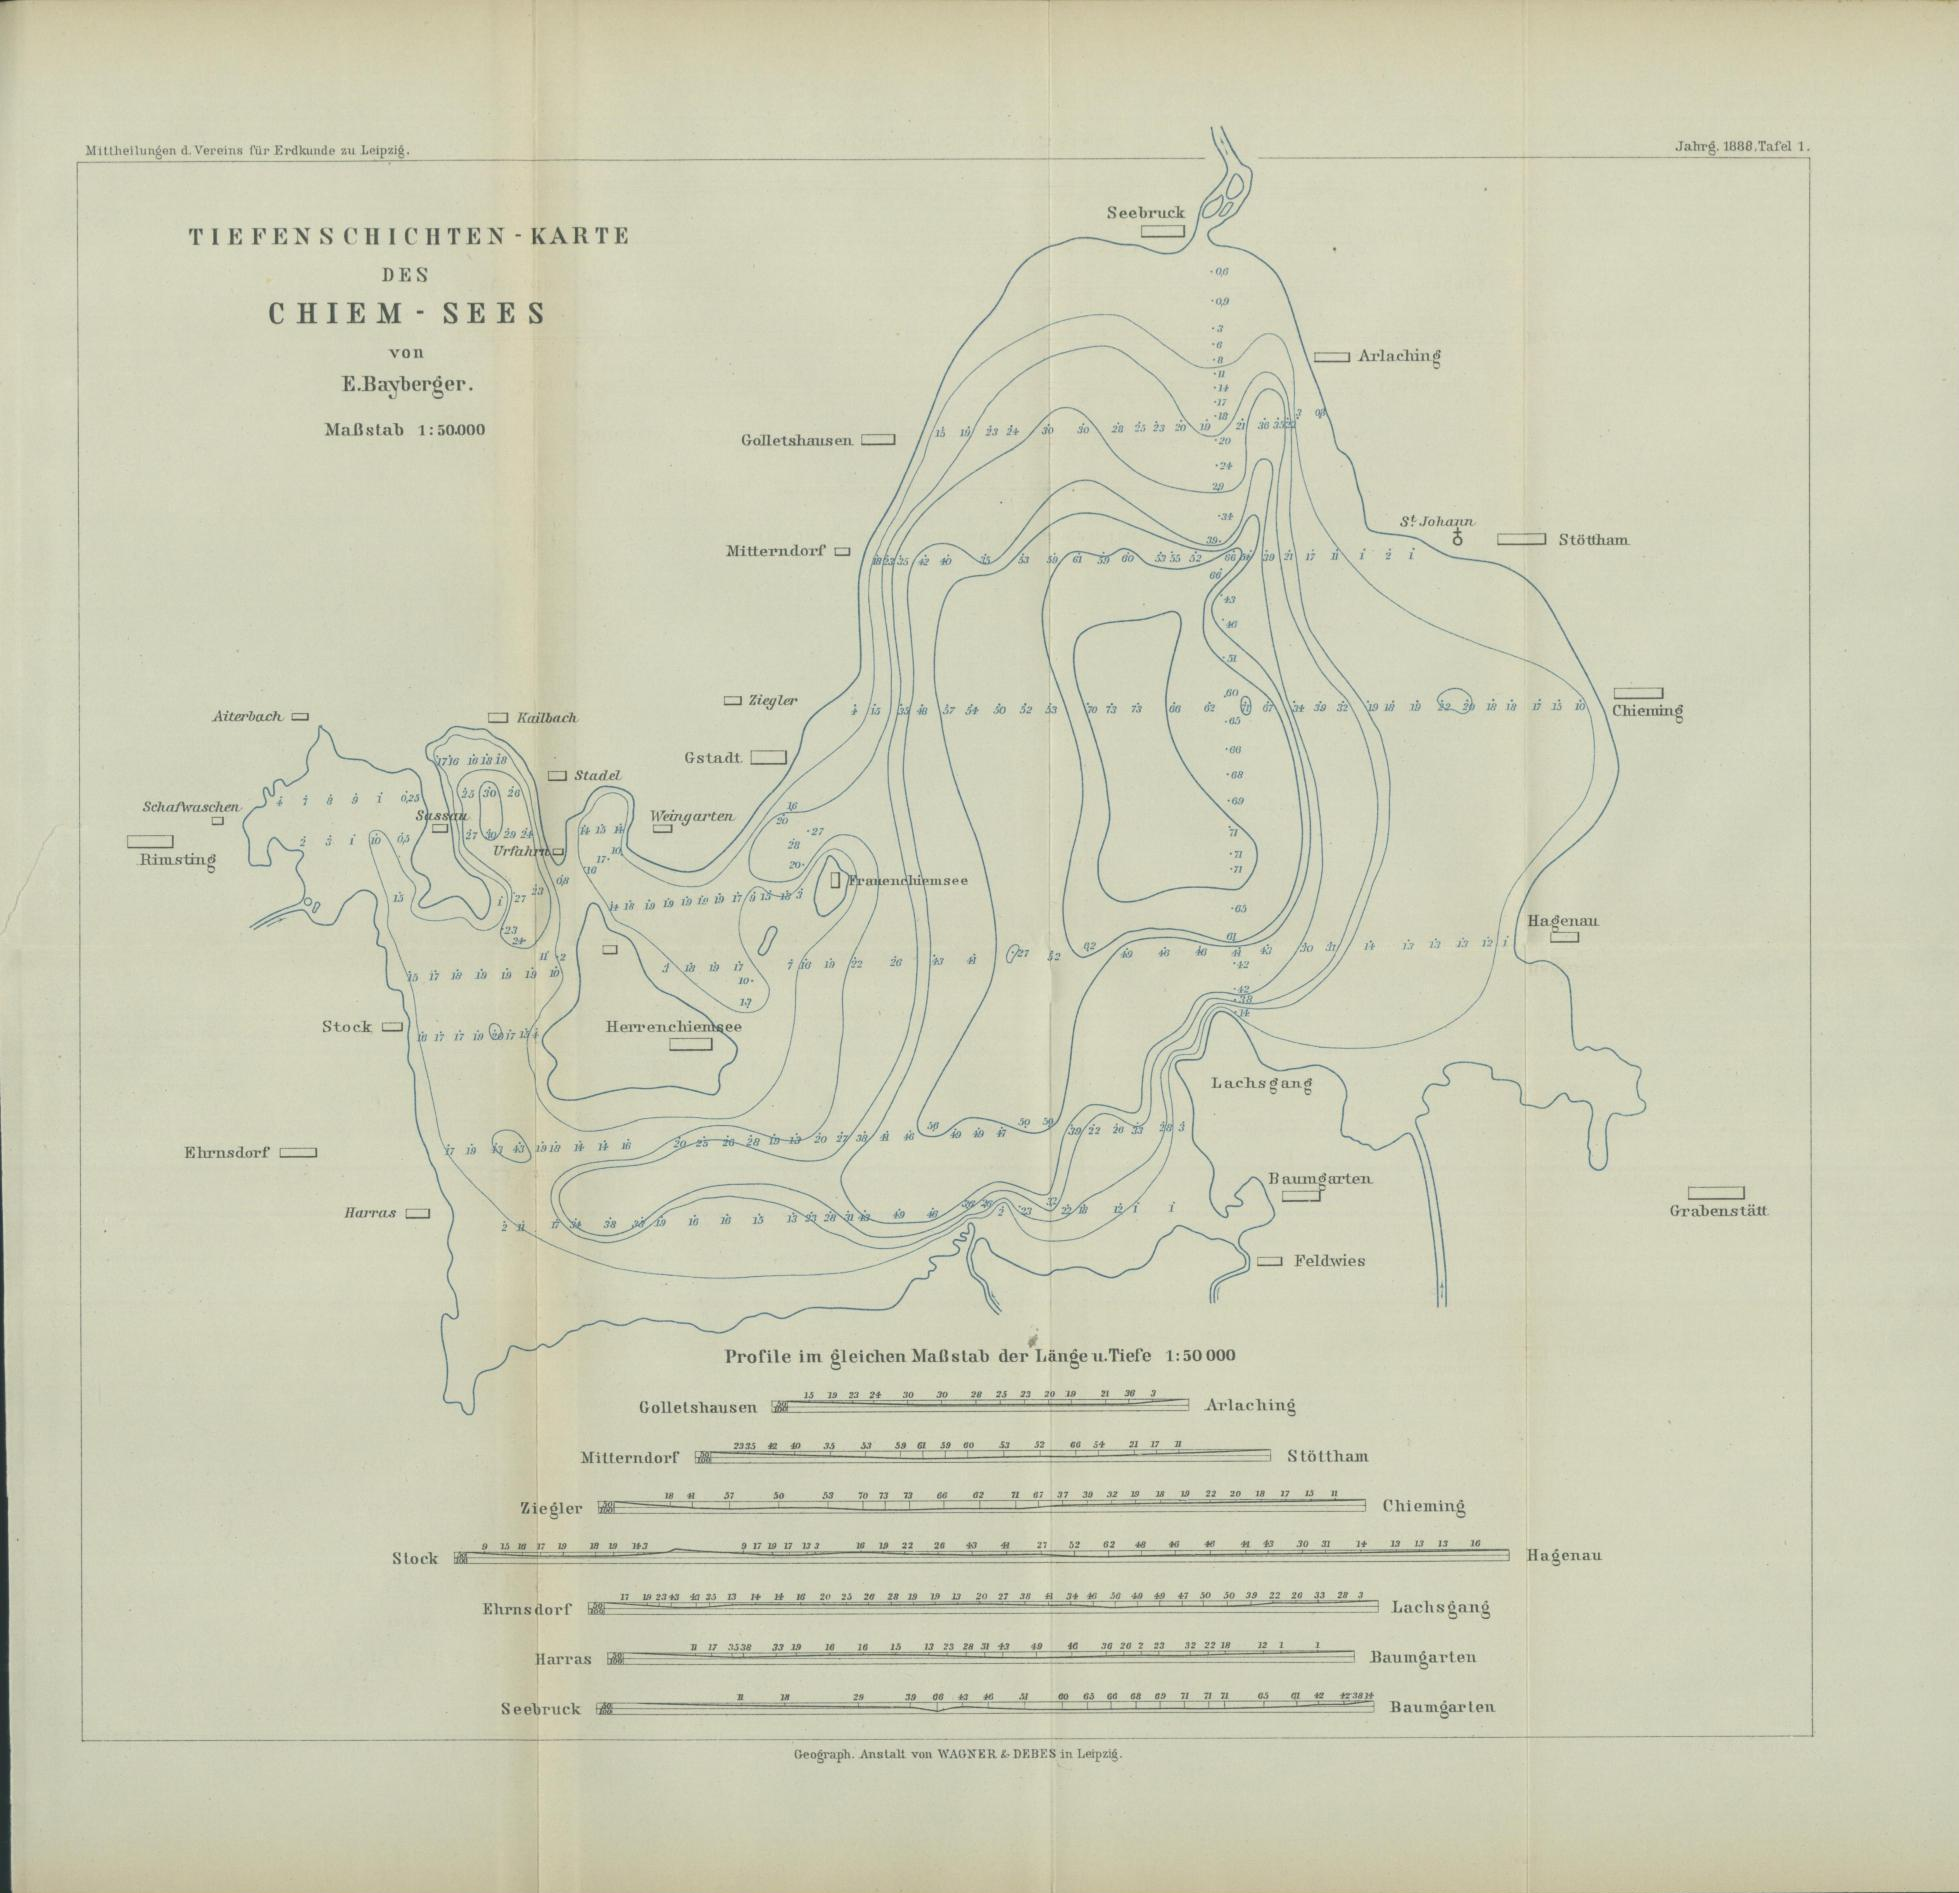 Datei Chiemsee Karte Tiefen Jpg Wikipedia